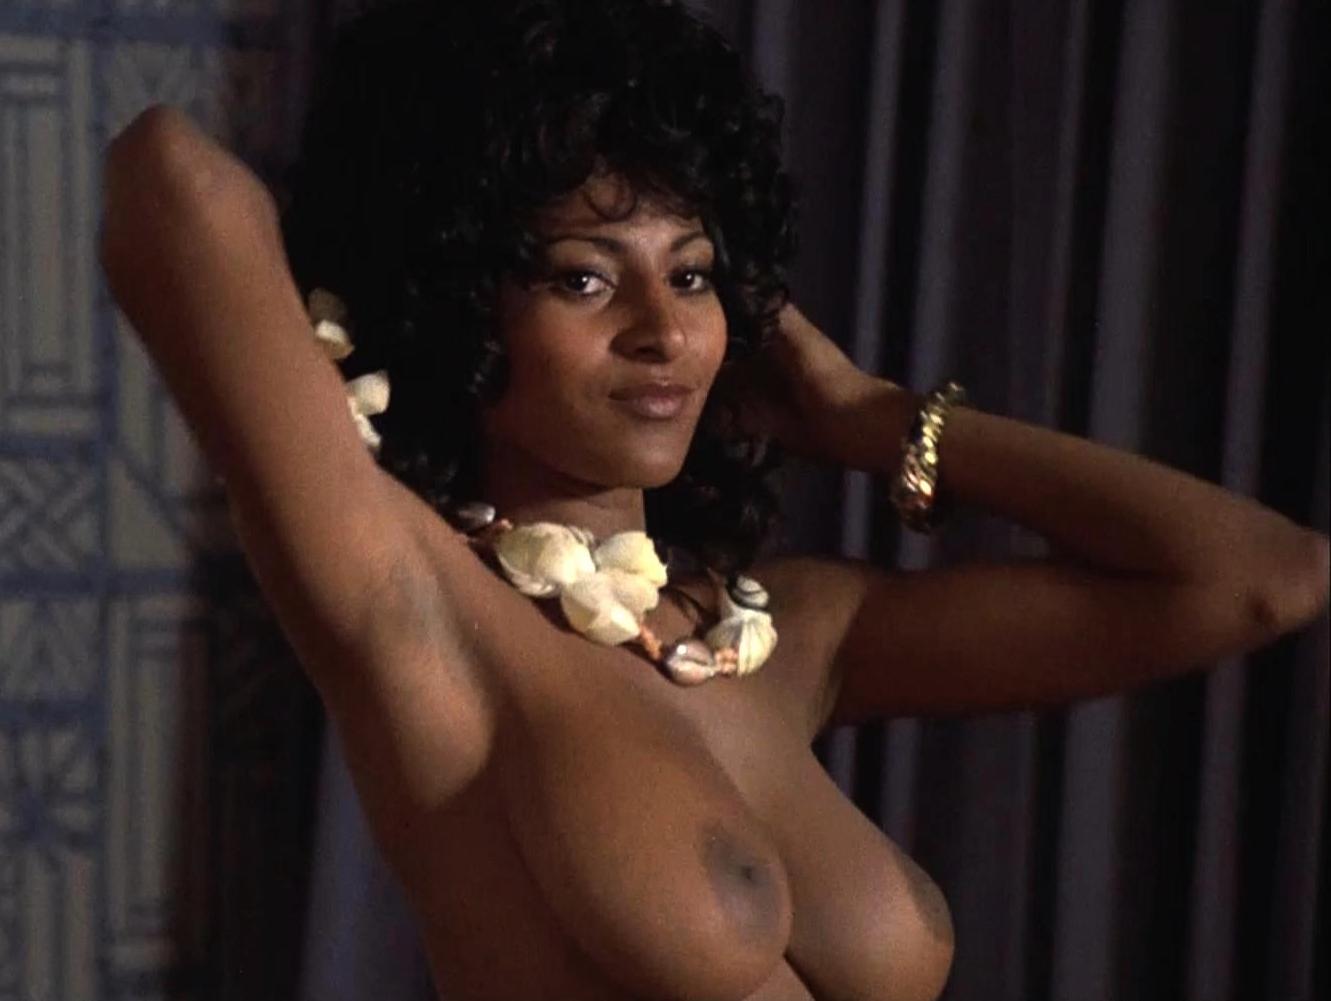 Pam griers boob pics 825